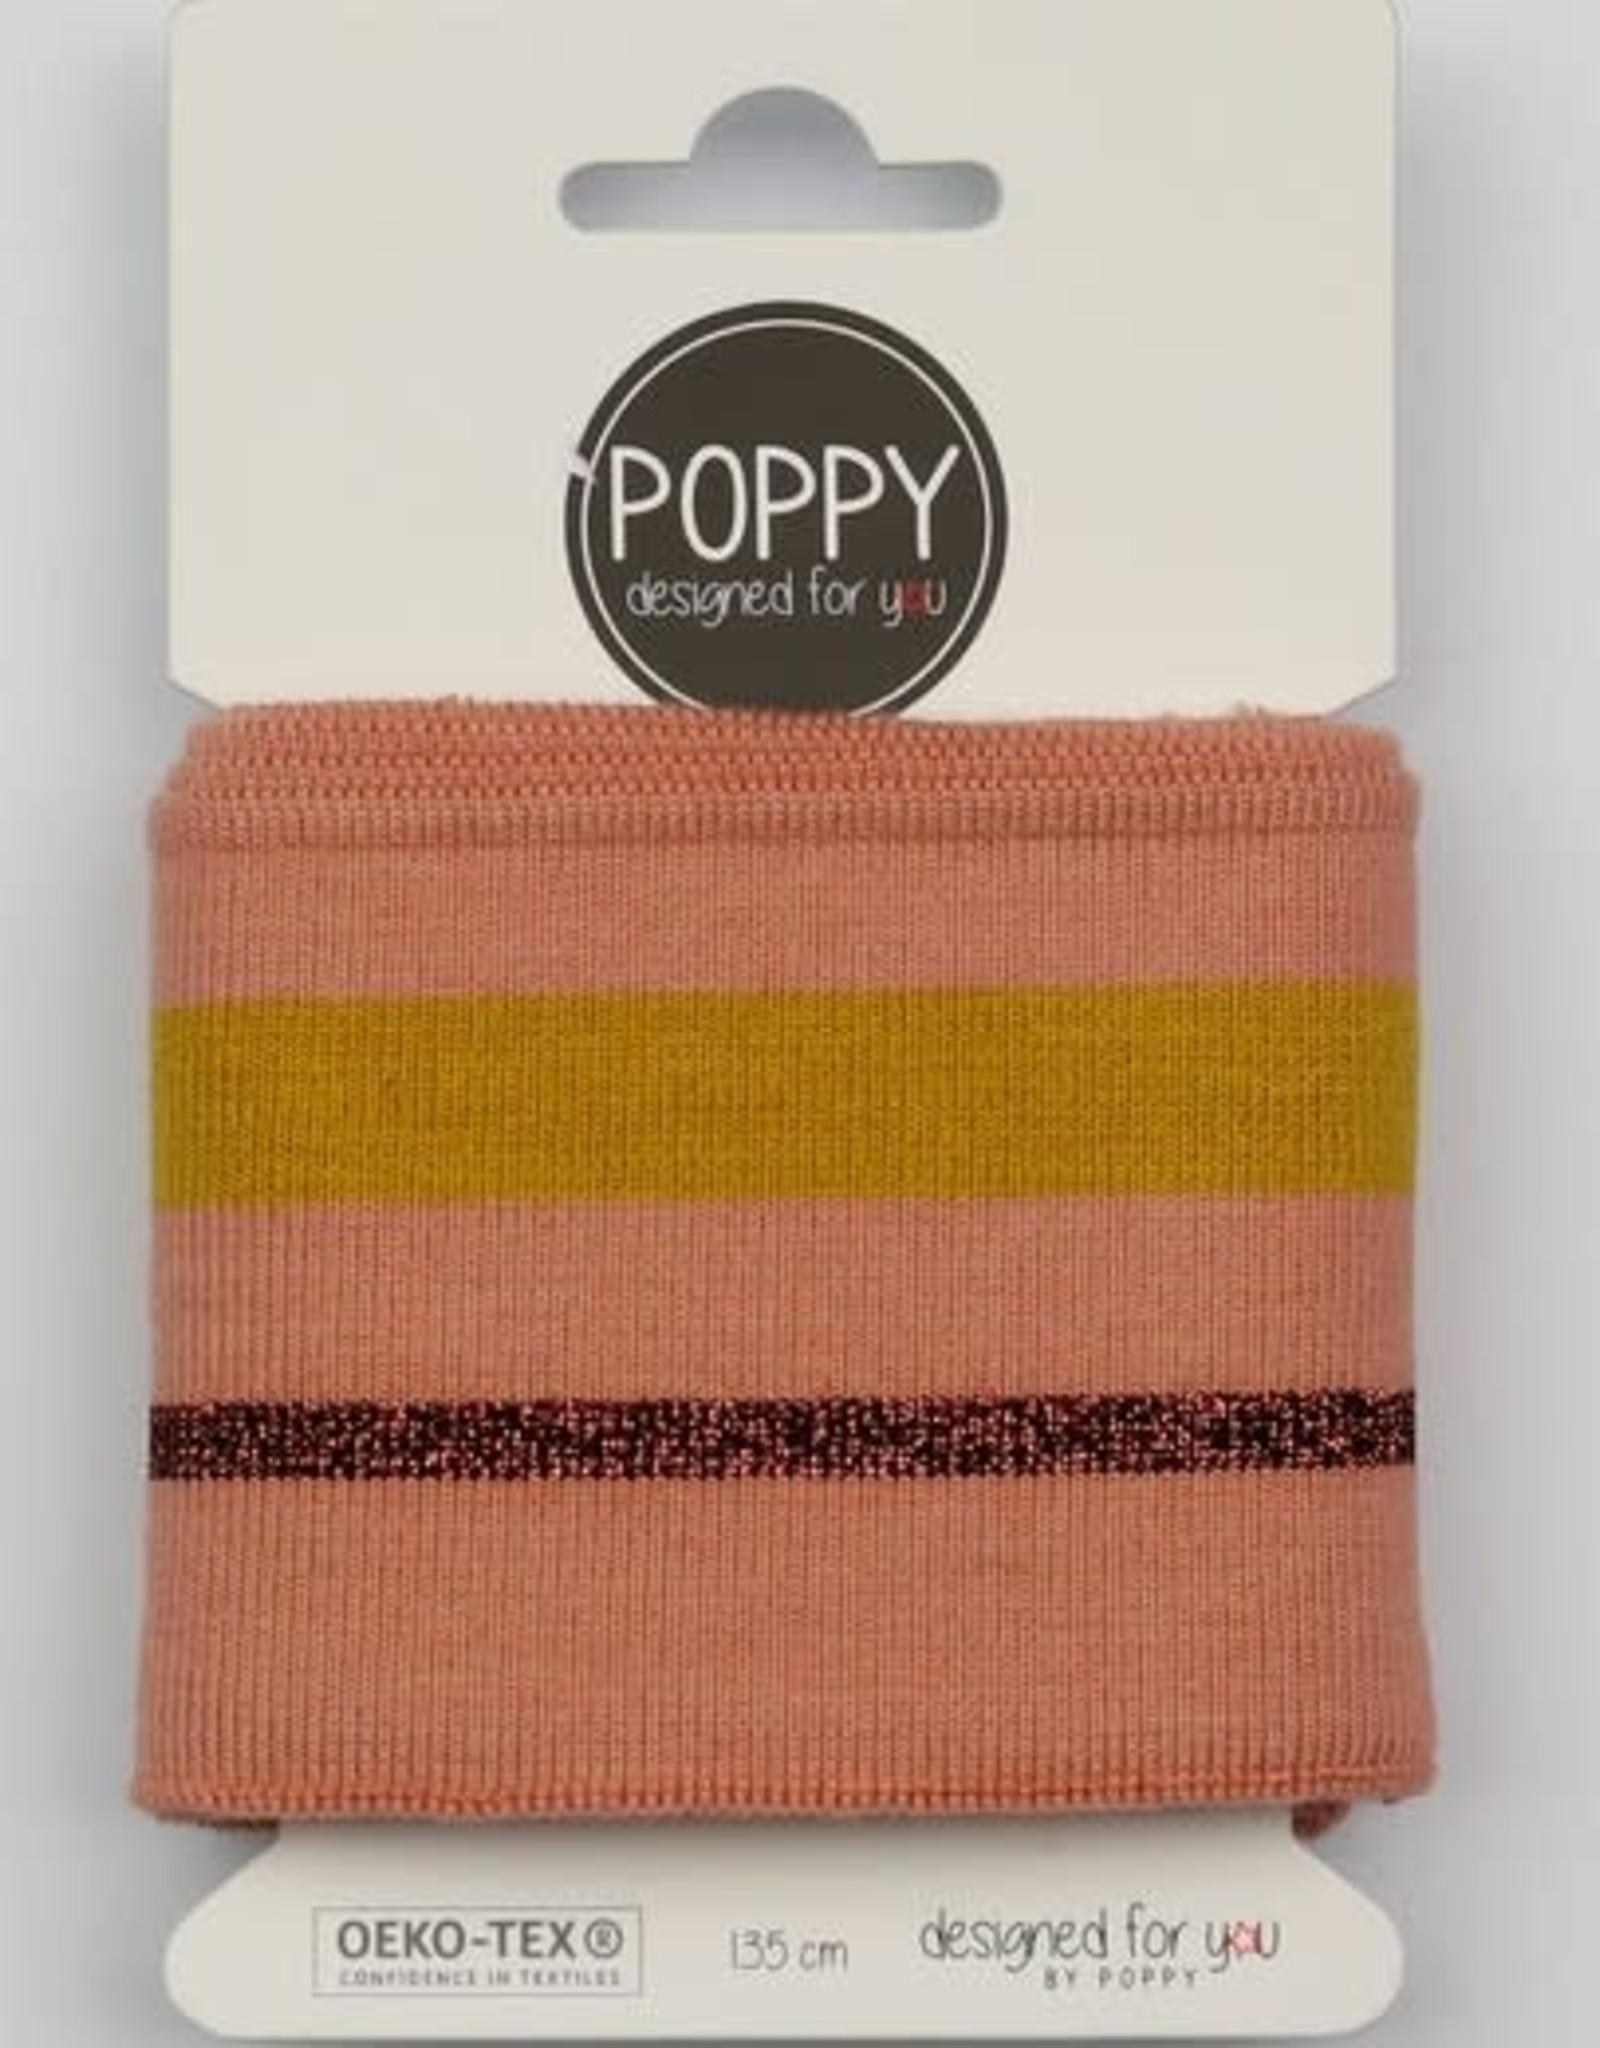 Poppy Cuffs 2 strepen zalm, oker-lurex koper 135*7cm